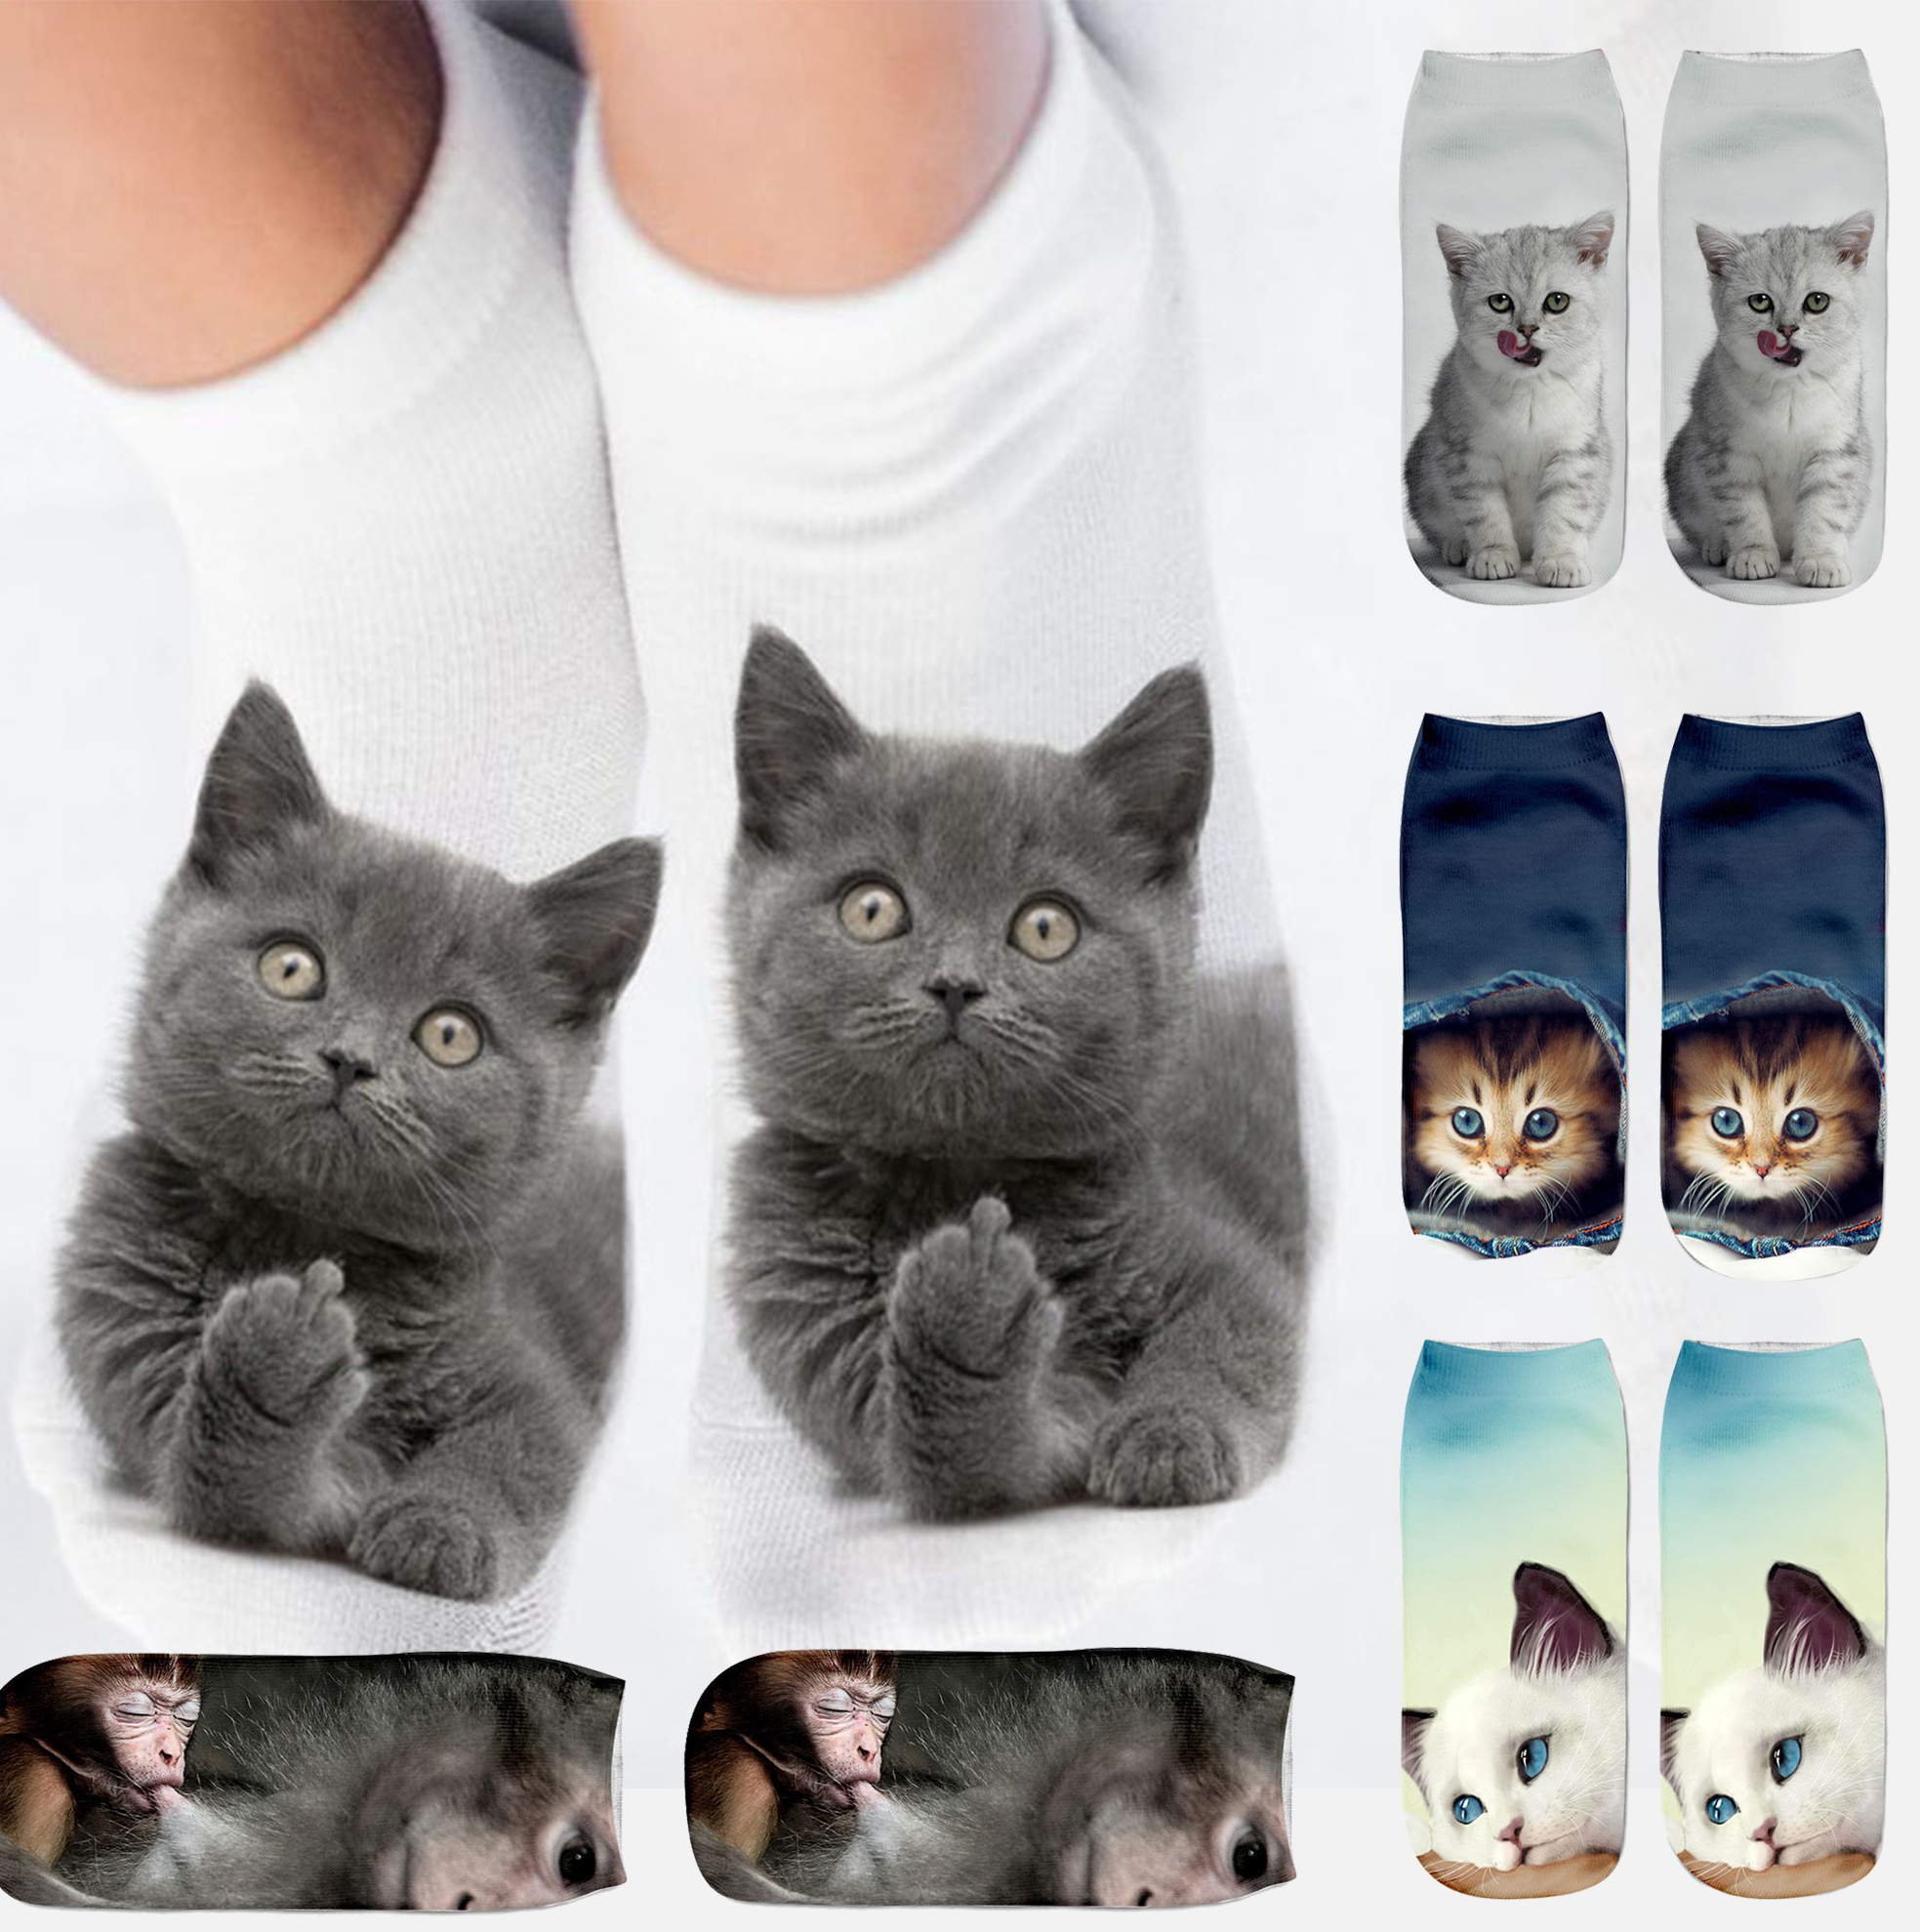 Cartoon Cat Sock 3D Cat Printed Cotton Anklet Socks Low Cut Sports Sock Cute Designer Women Girl Casual Socks